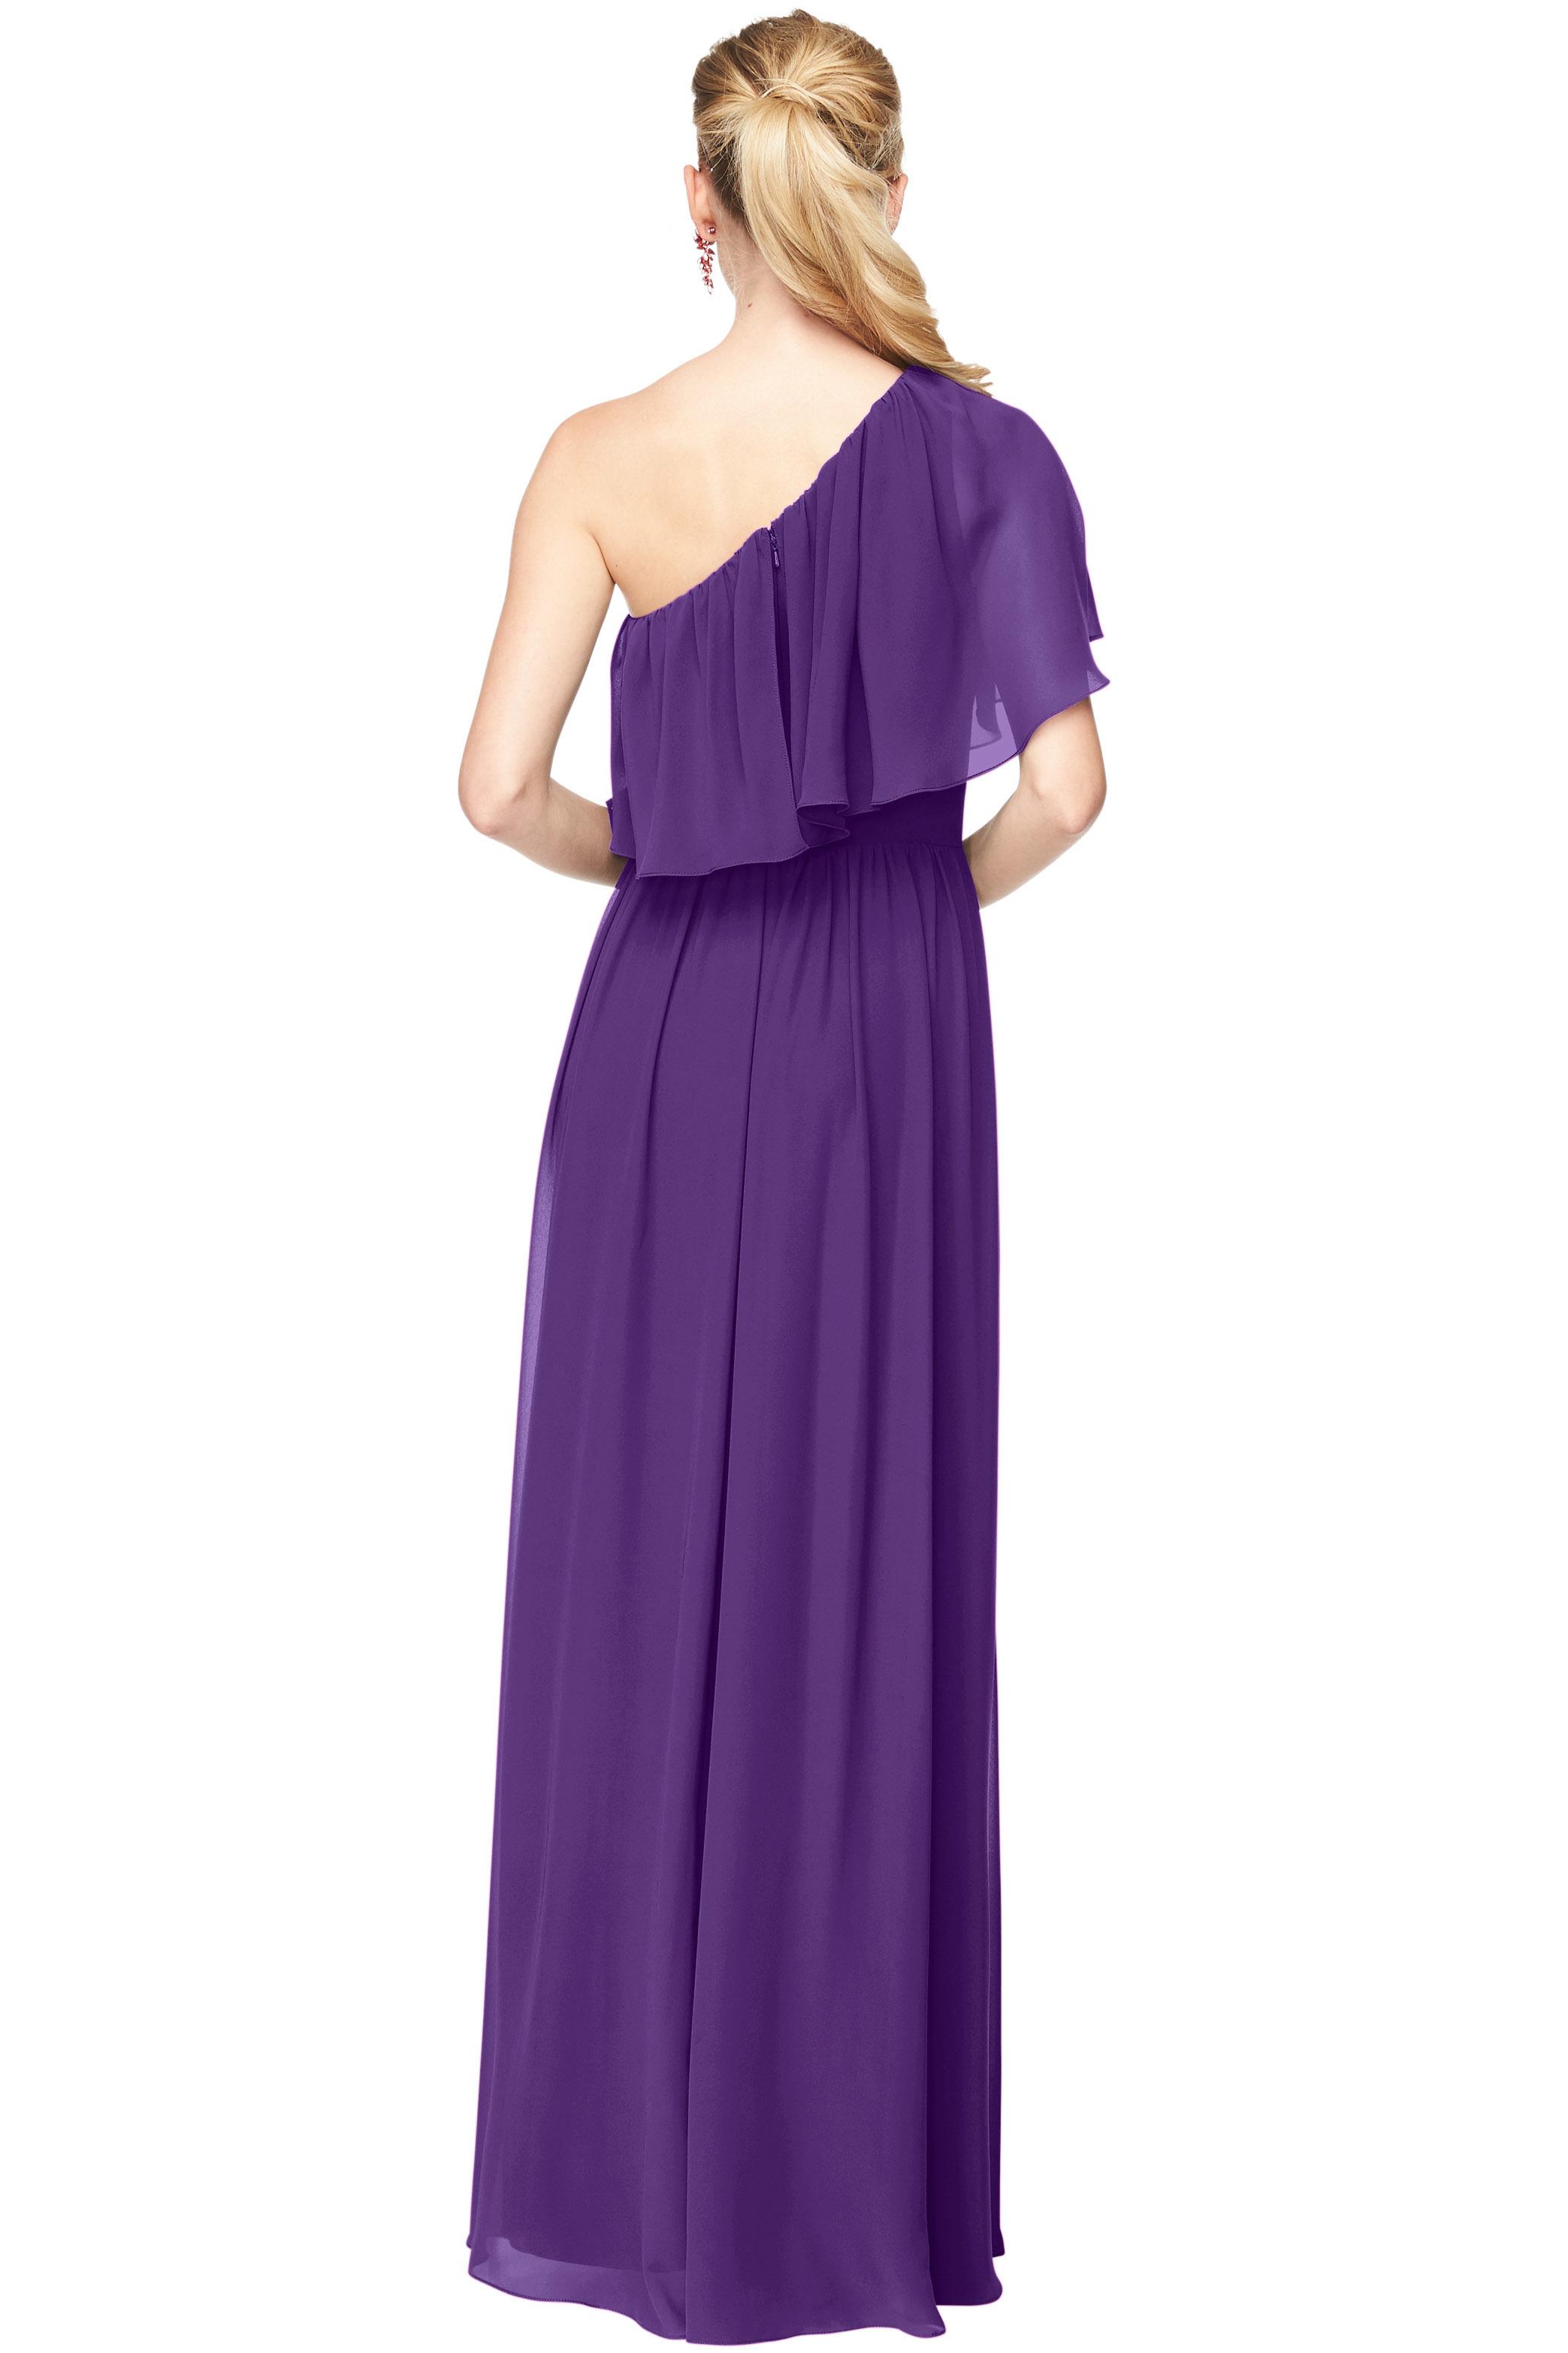 Bill Levkoff REGENCY Chiffon One Shoulder A-Line gown, $184.00 Back